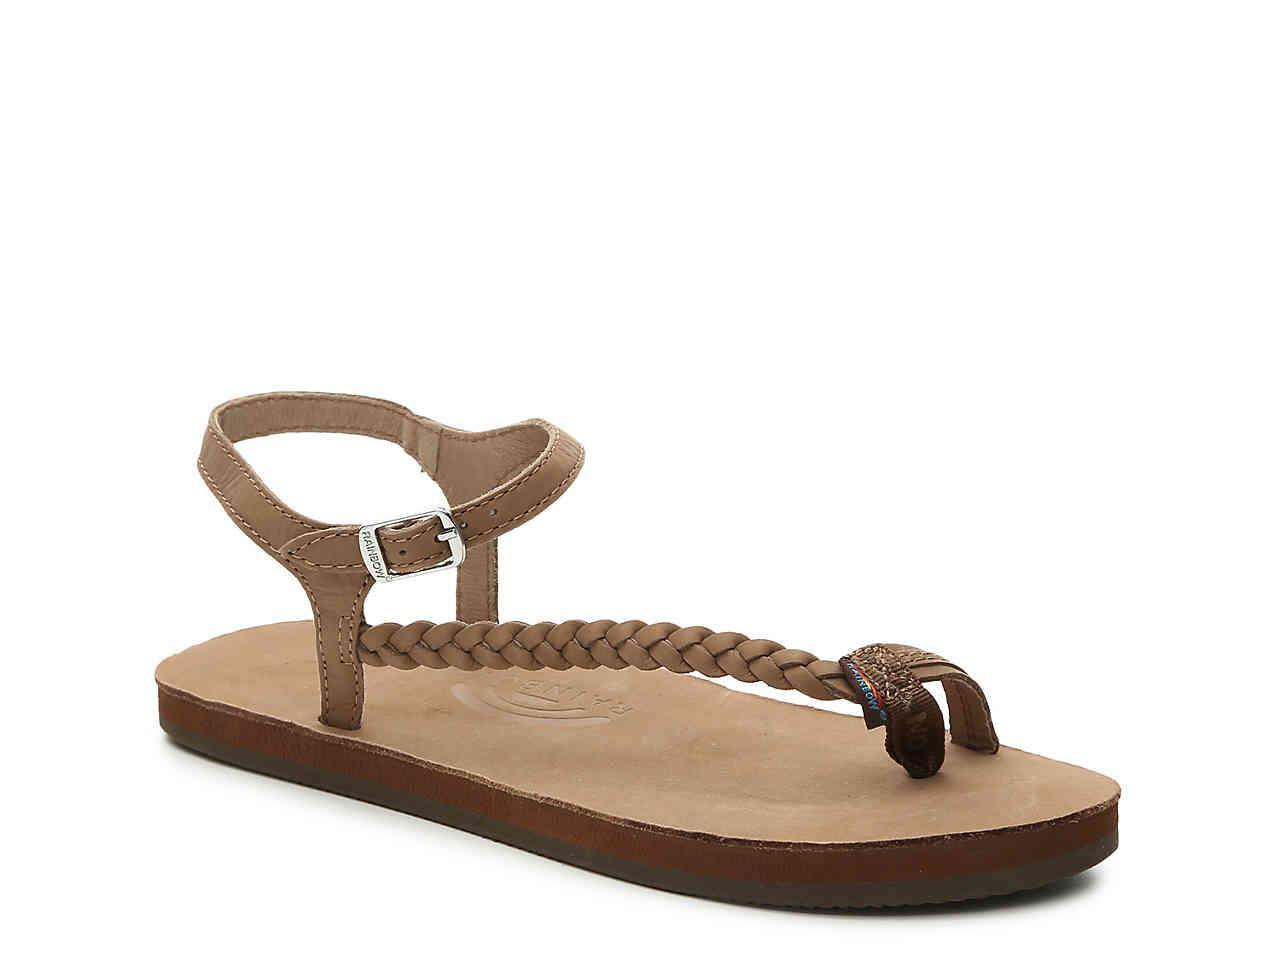 3df109544 Rainbow Sandals - Brown Marley Flat Sandal - Lyst. View fullscreen